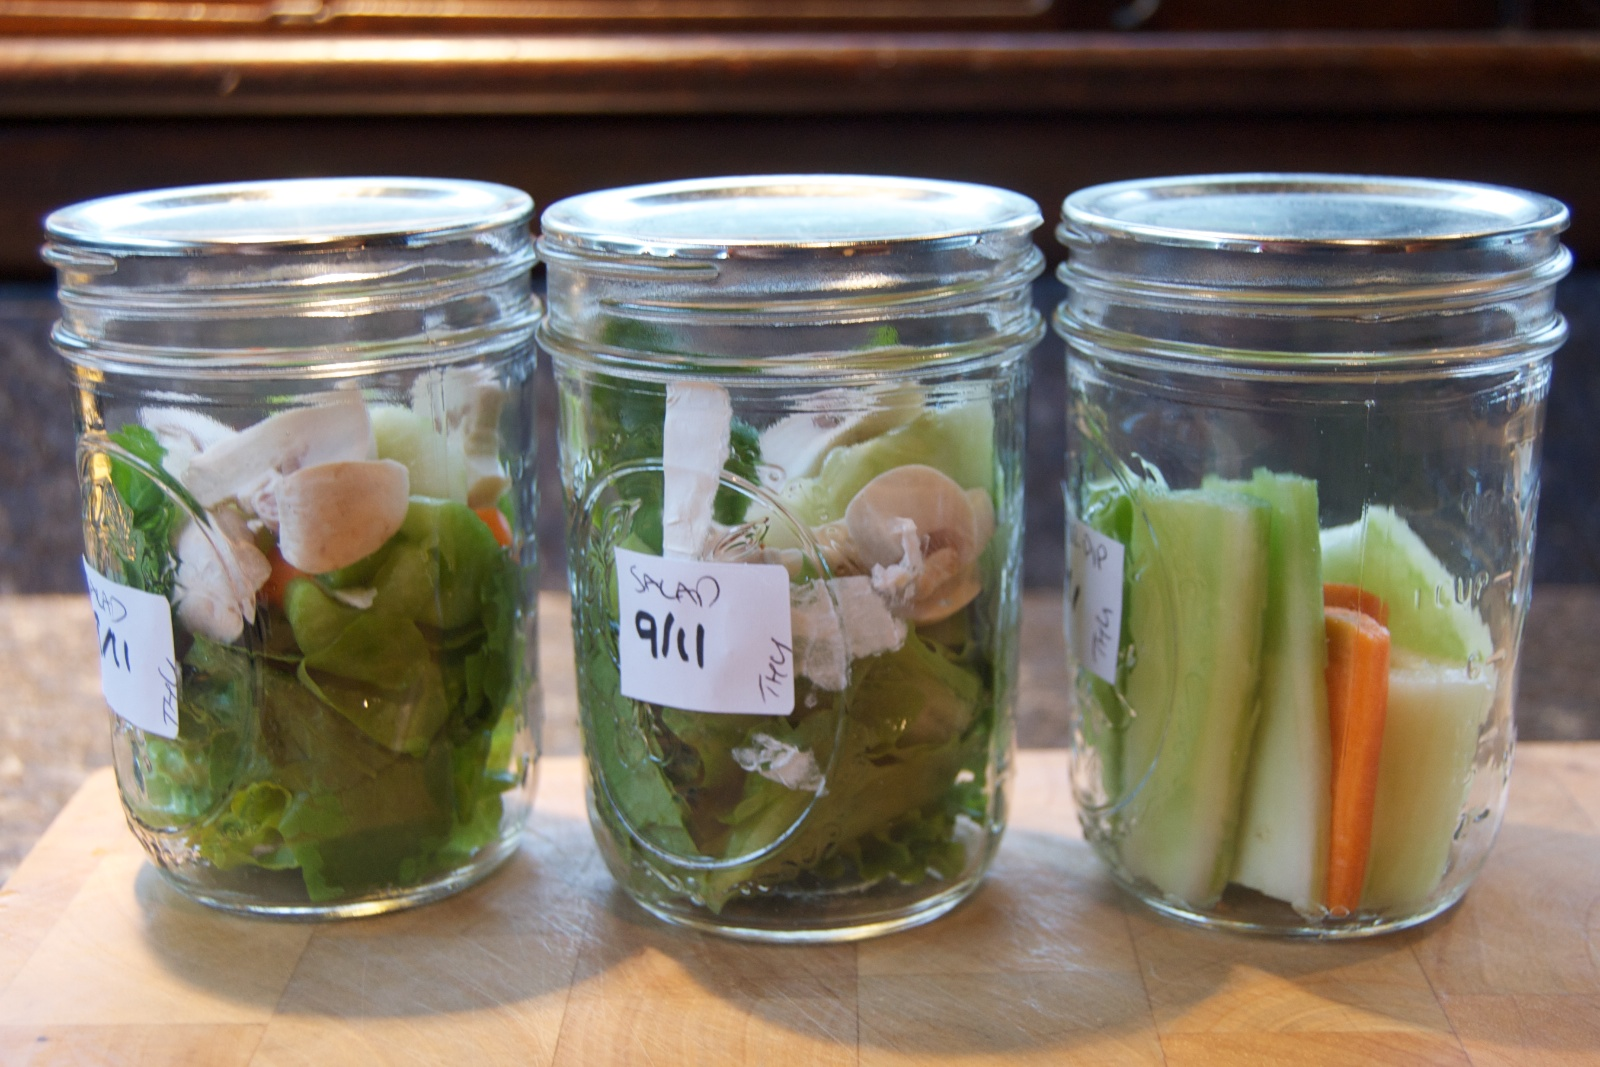 http://blog.rickk.com/food/2014/09/11/ate.2014.09.11.c2.jpg